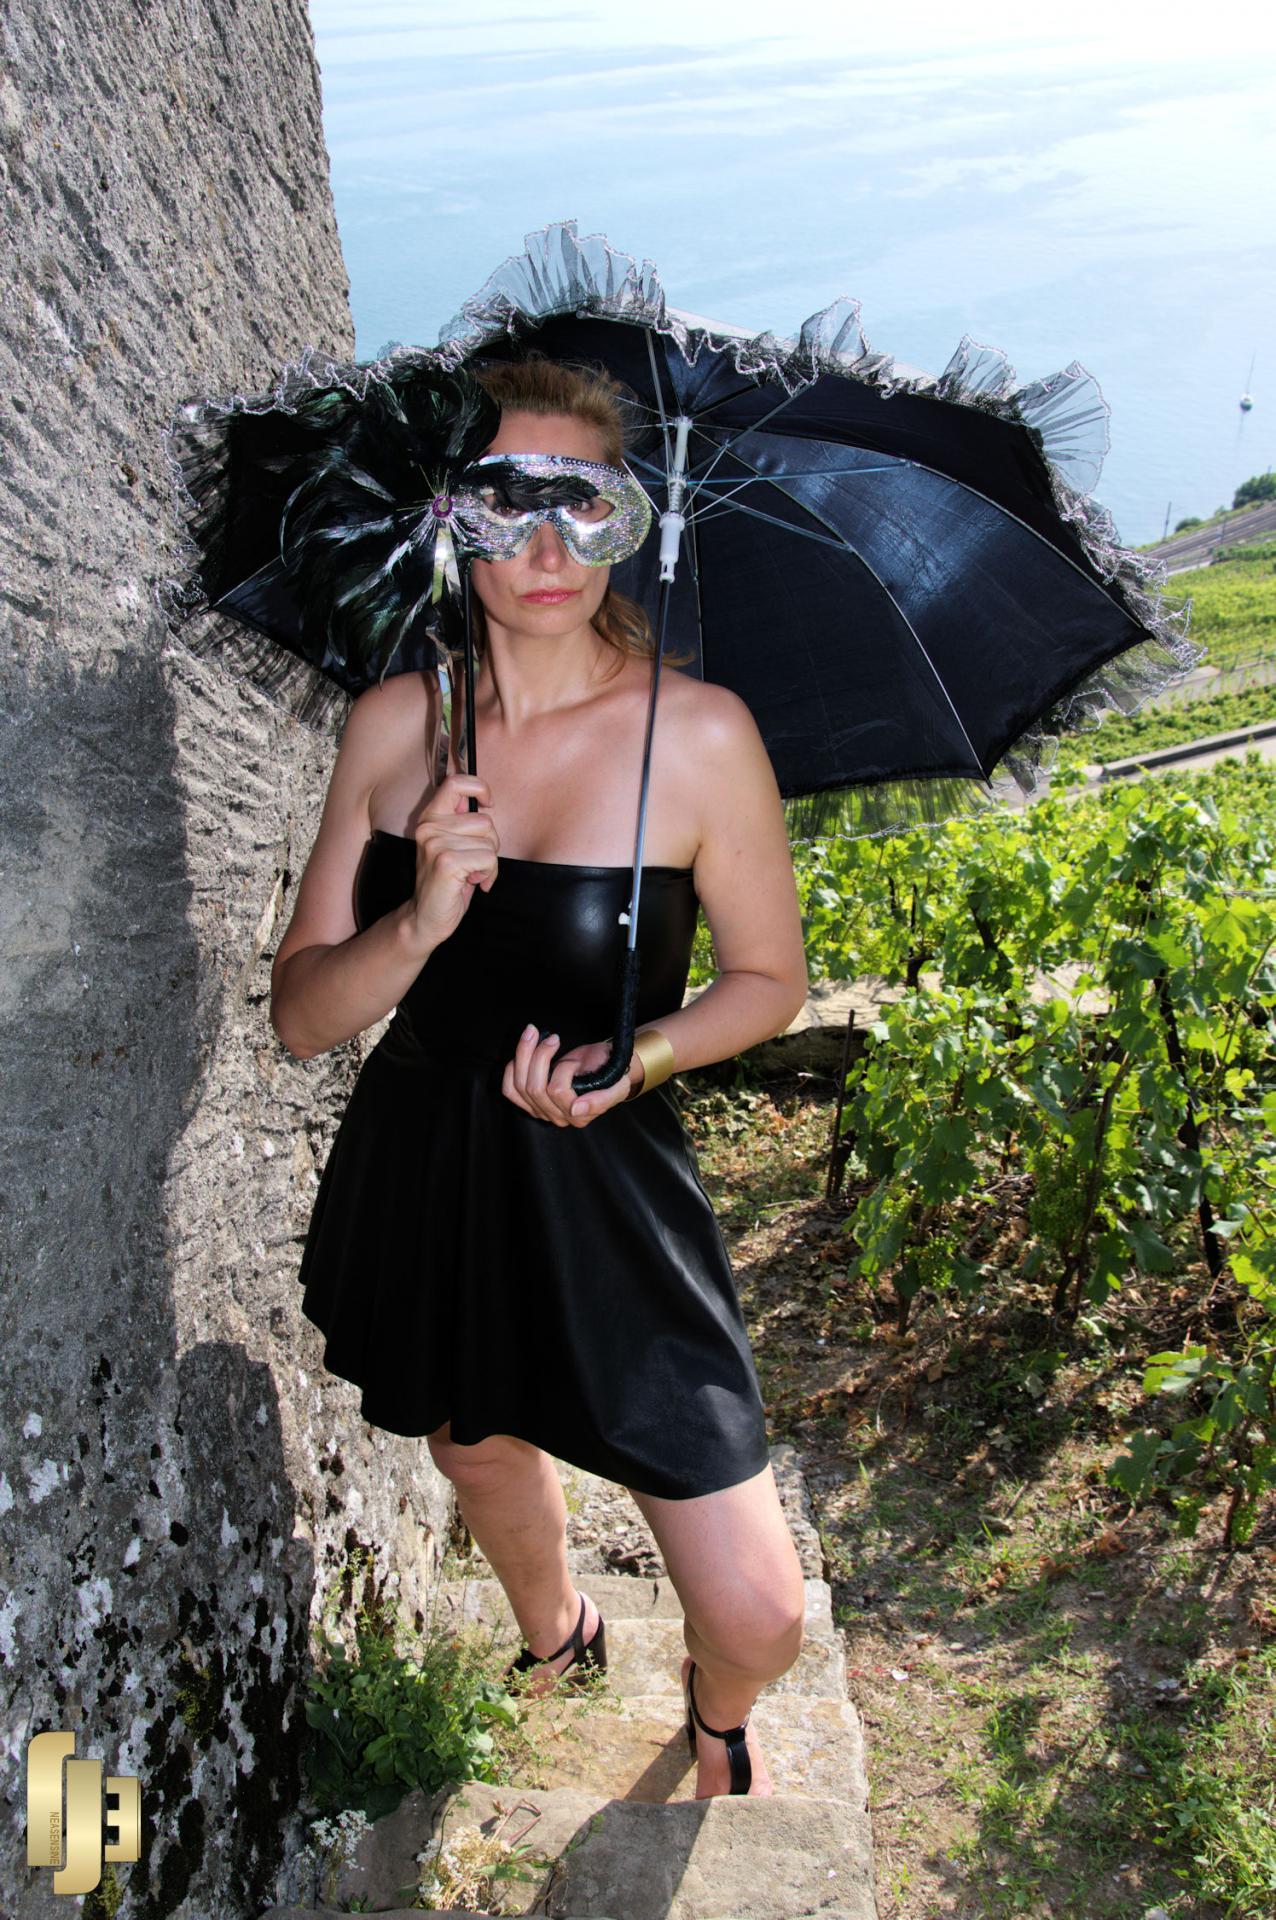 La vigneronne monte à sa vigne